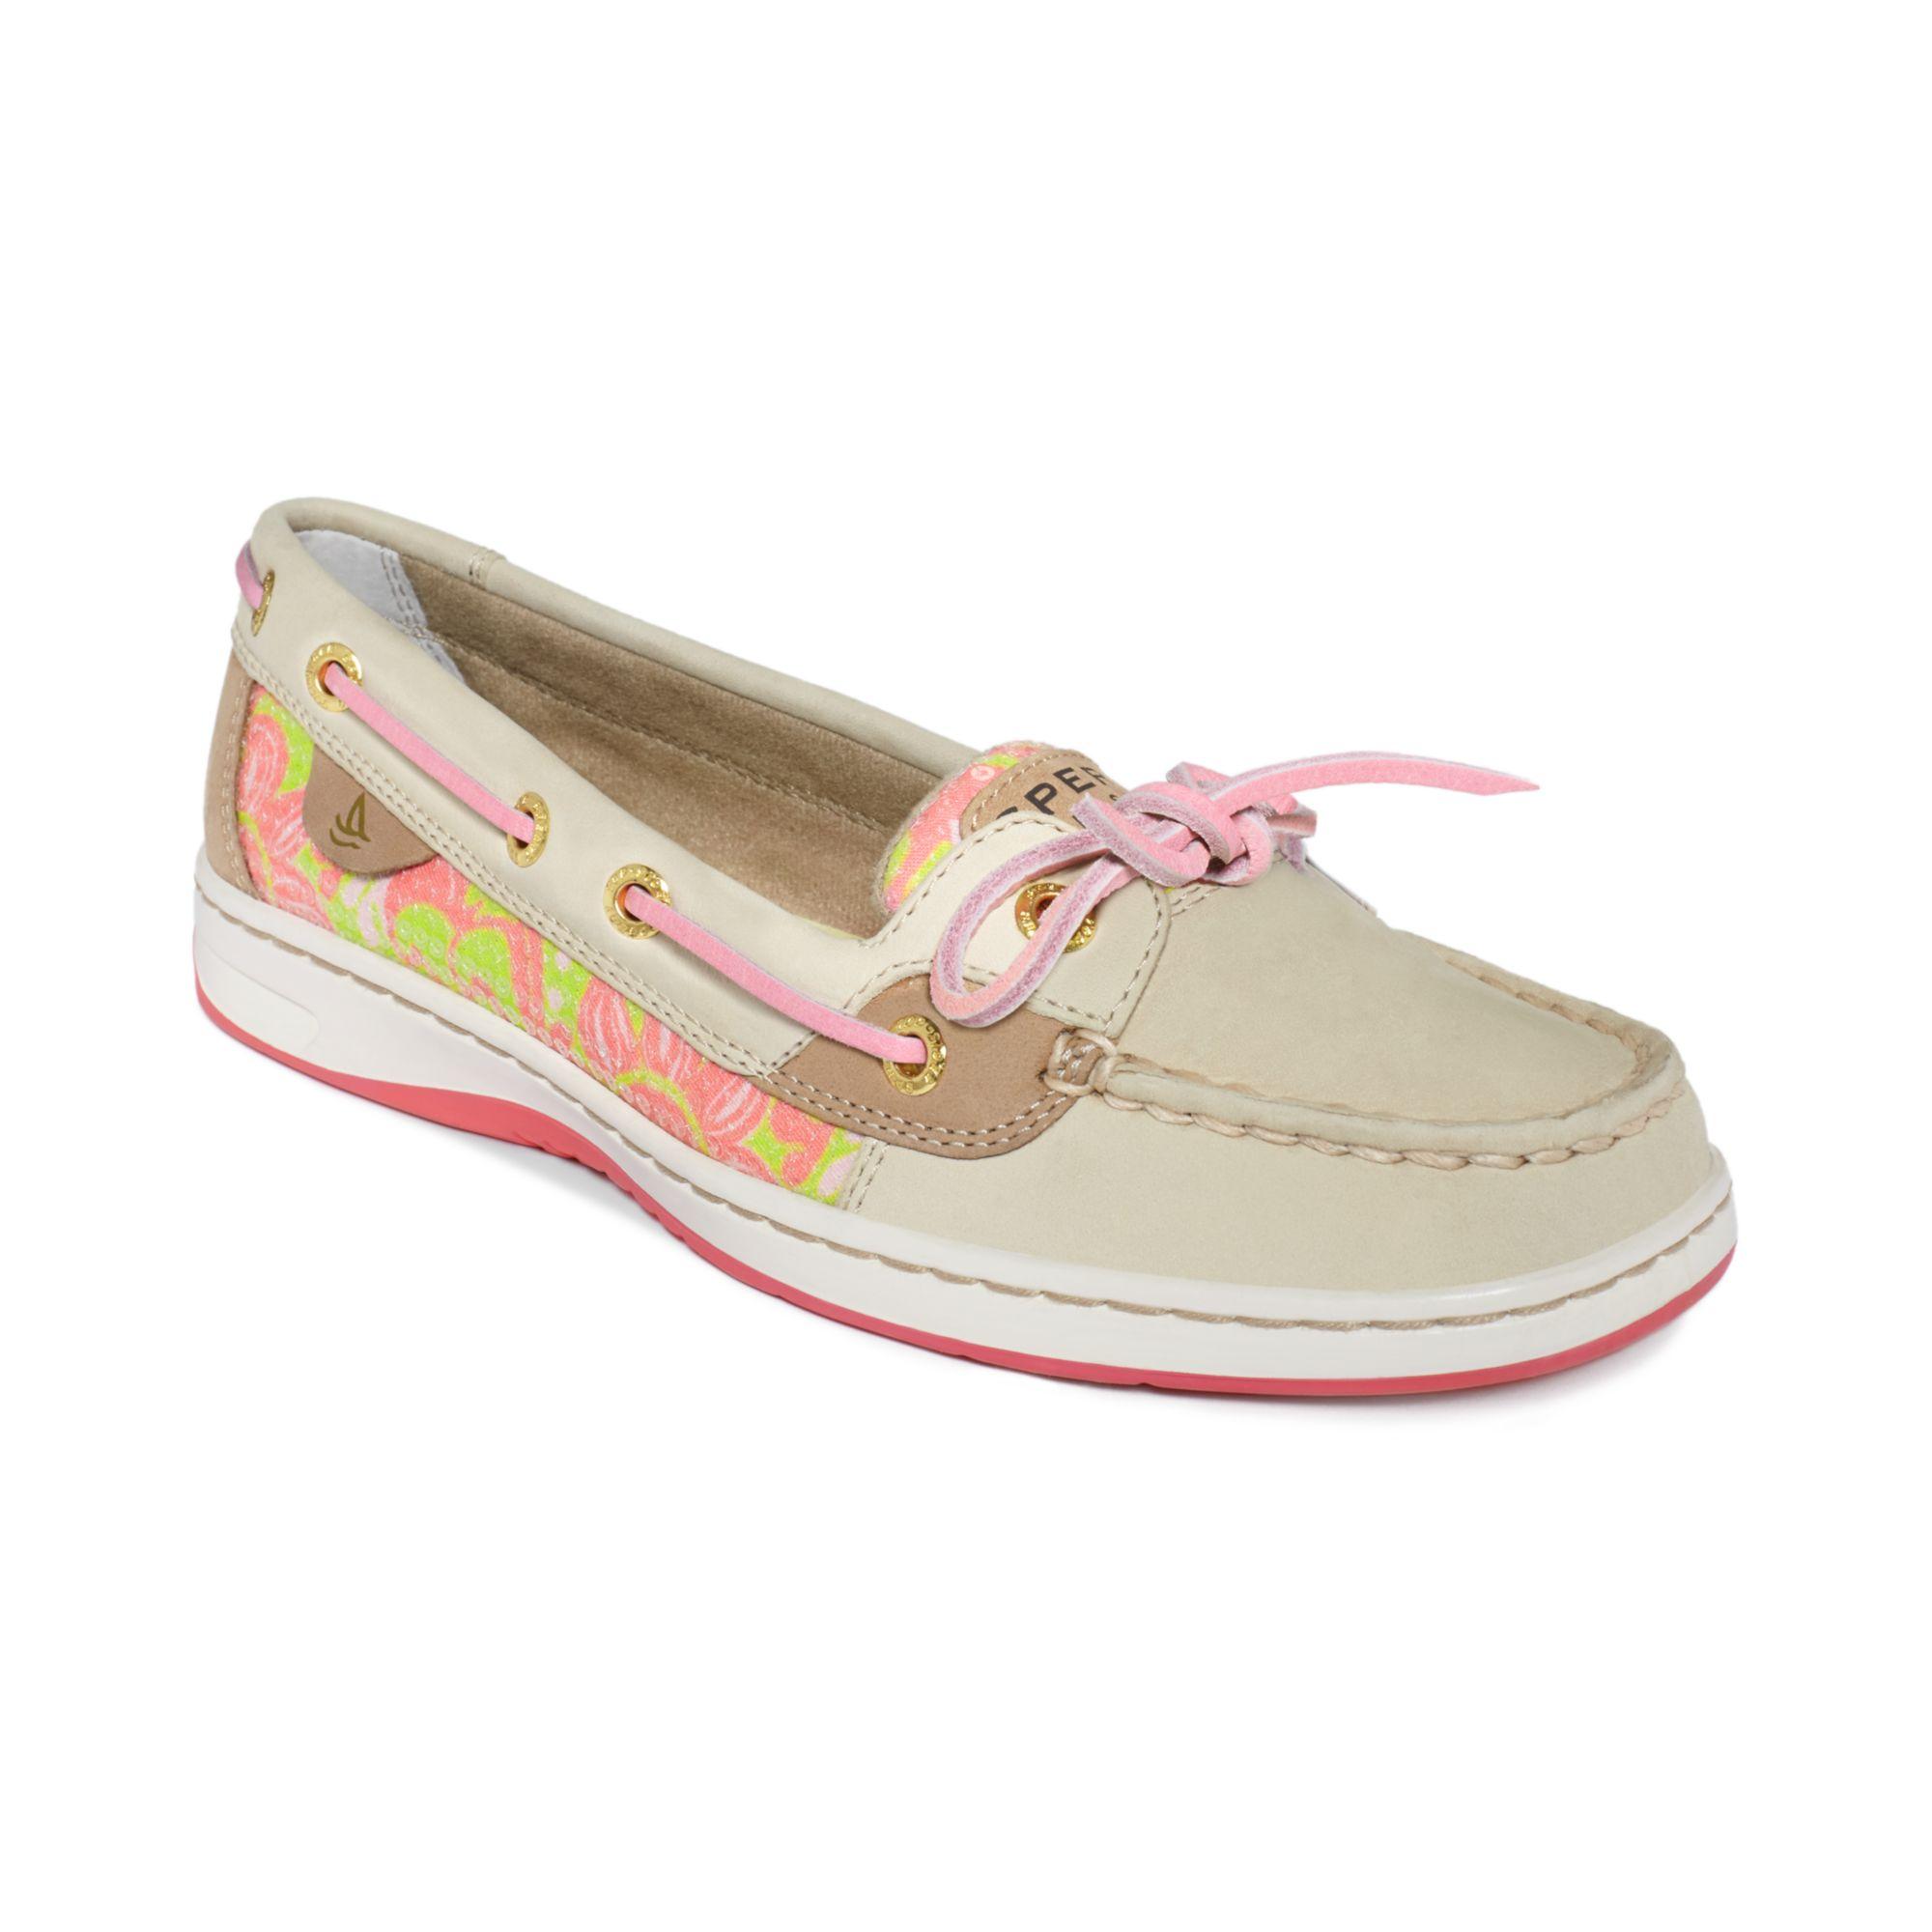 Designer Boat Shoes Womens